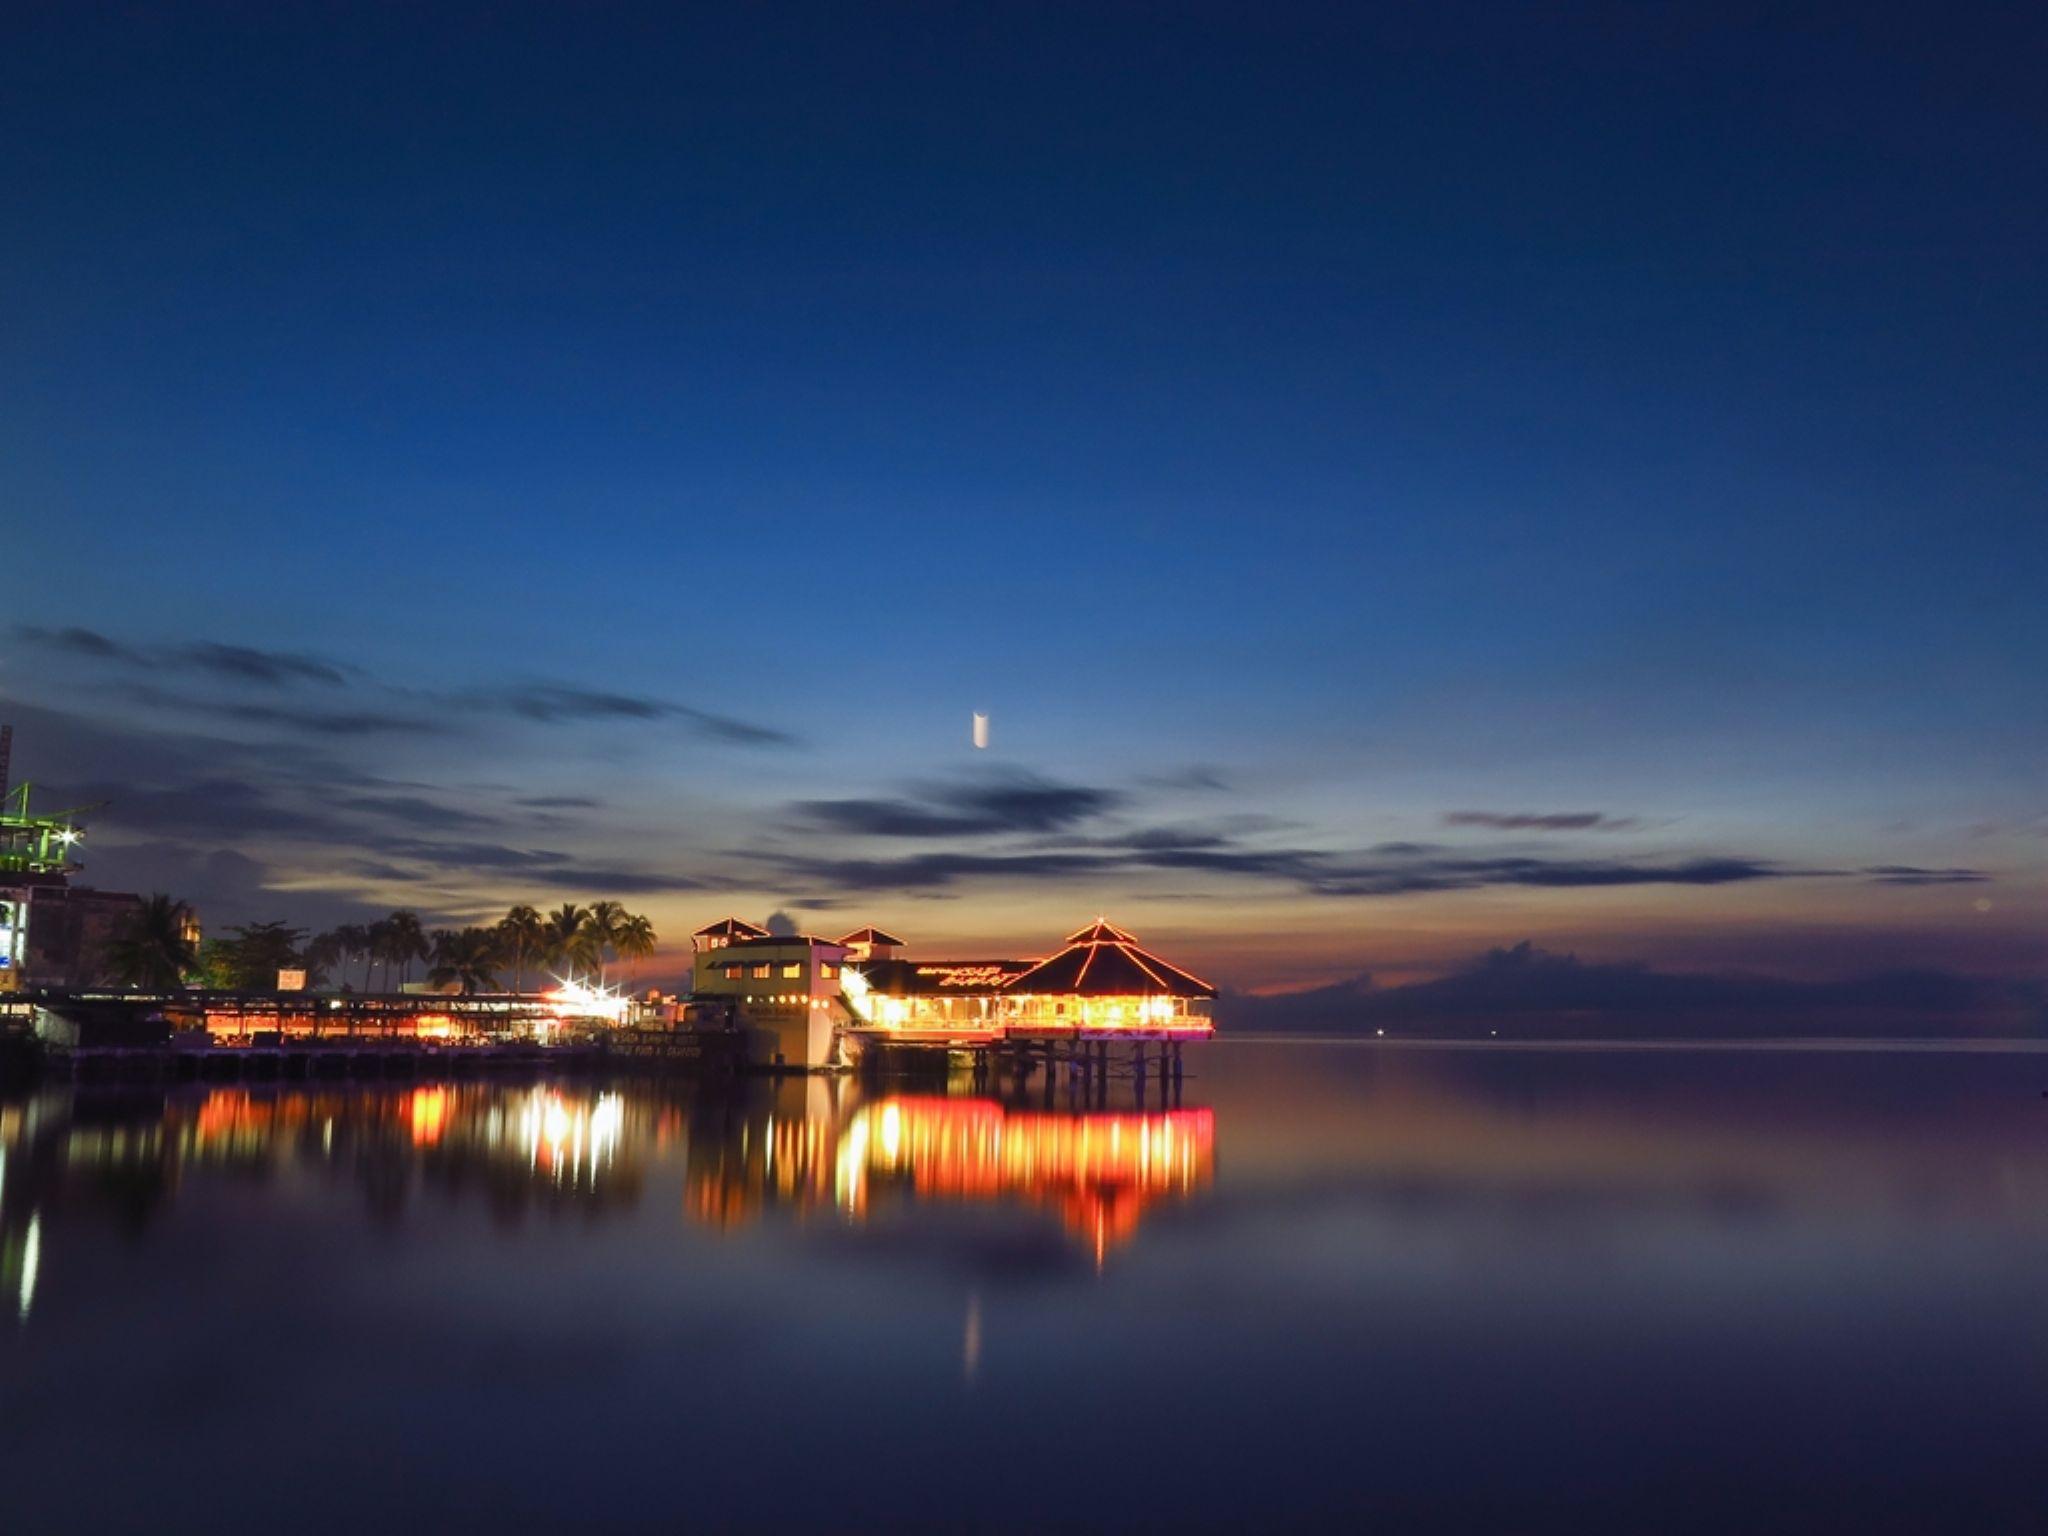 Wisata Bahari Kota Manado by fadlhy